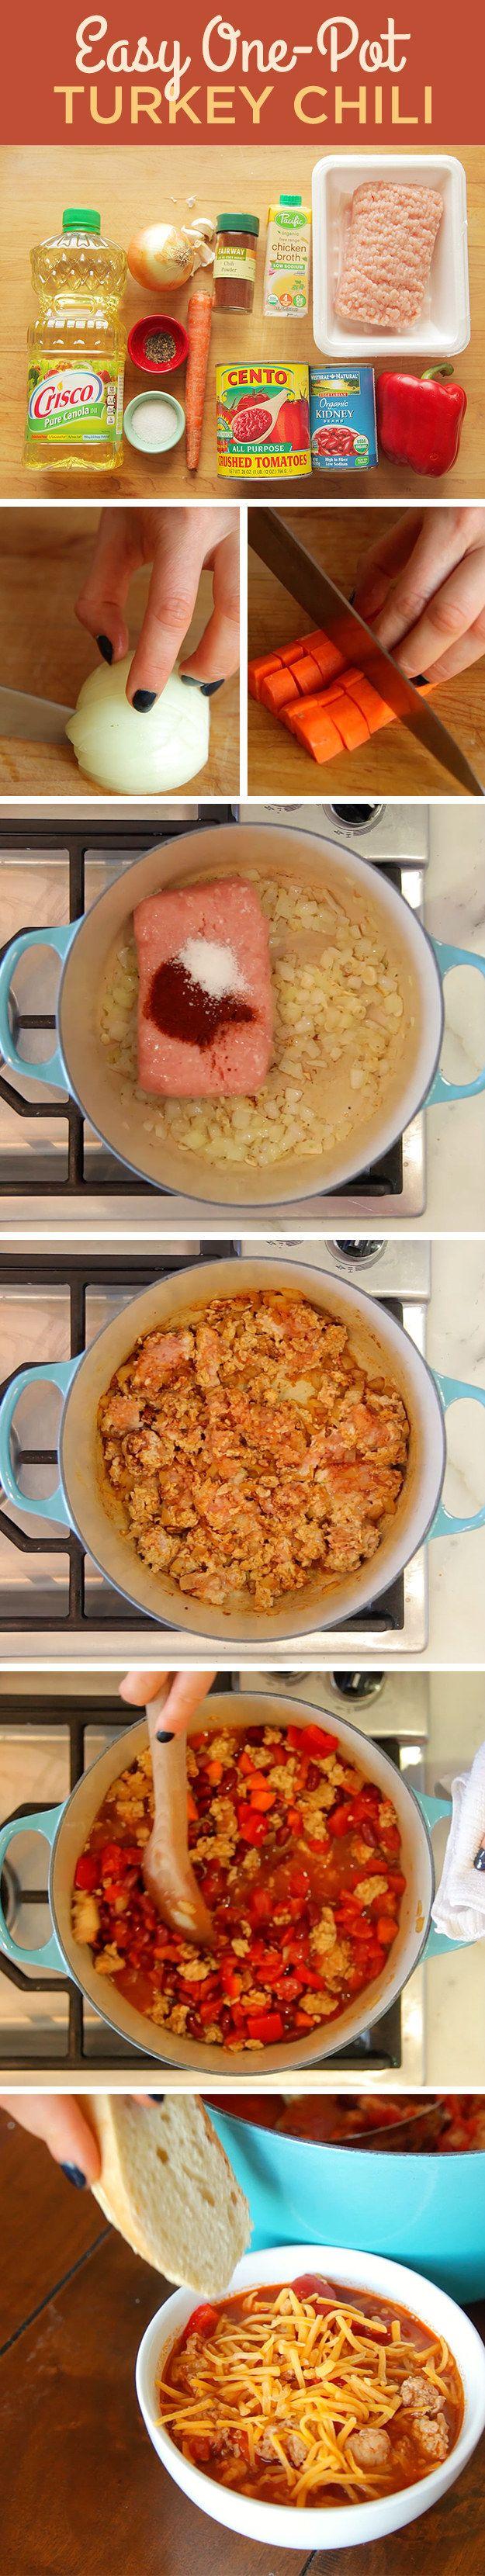 Classic One-Pot Turkey Chili